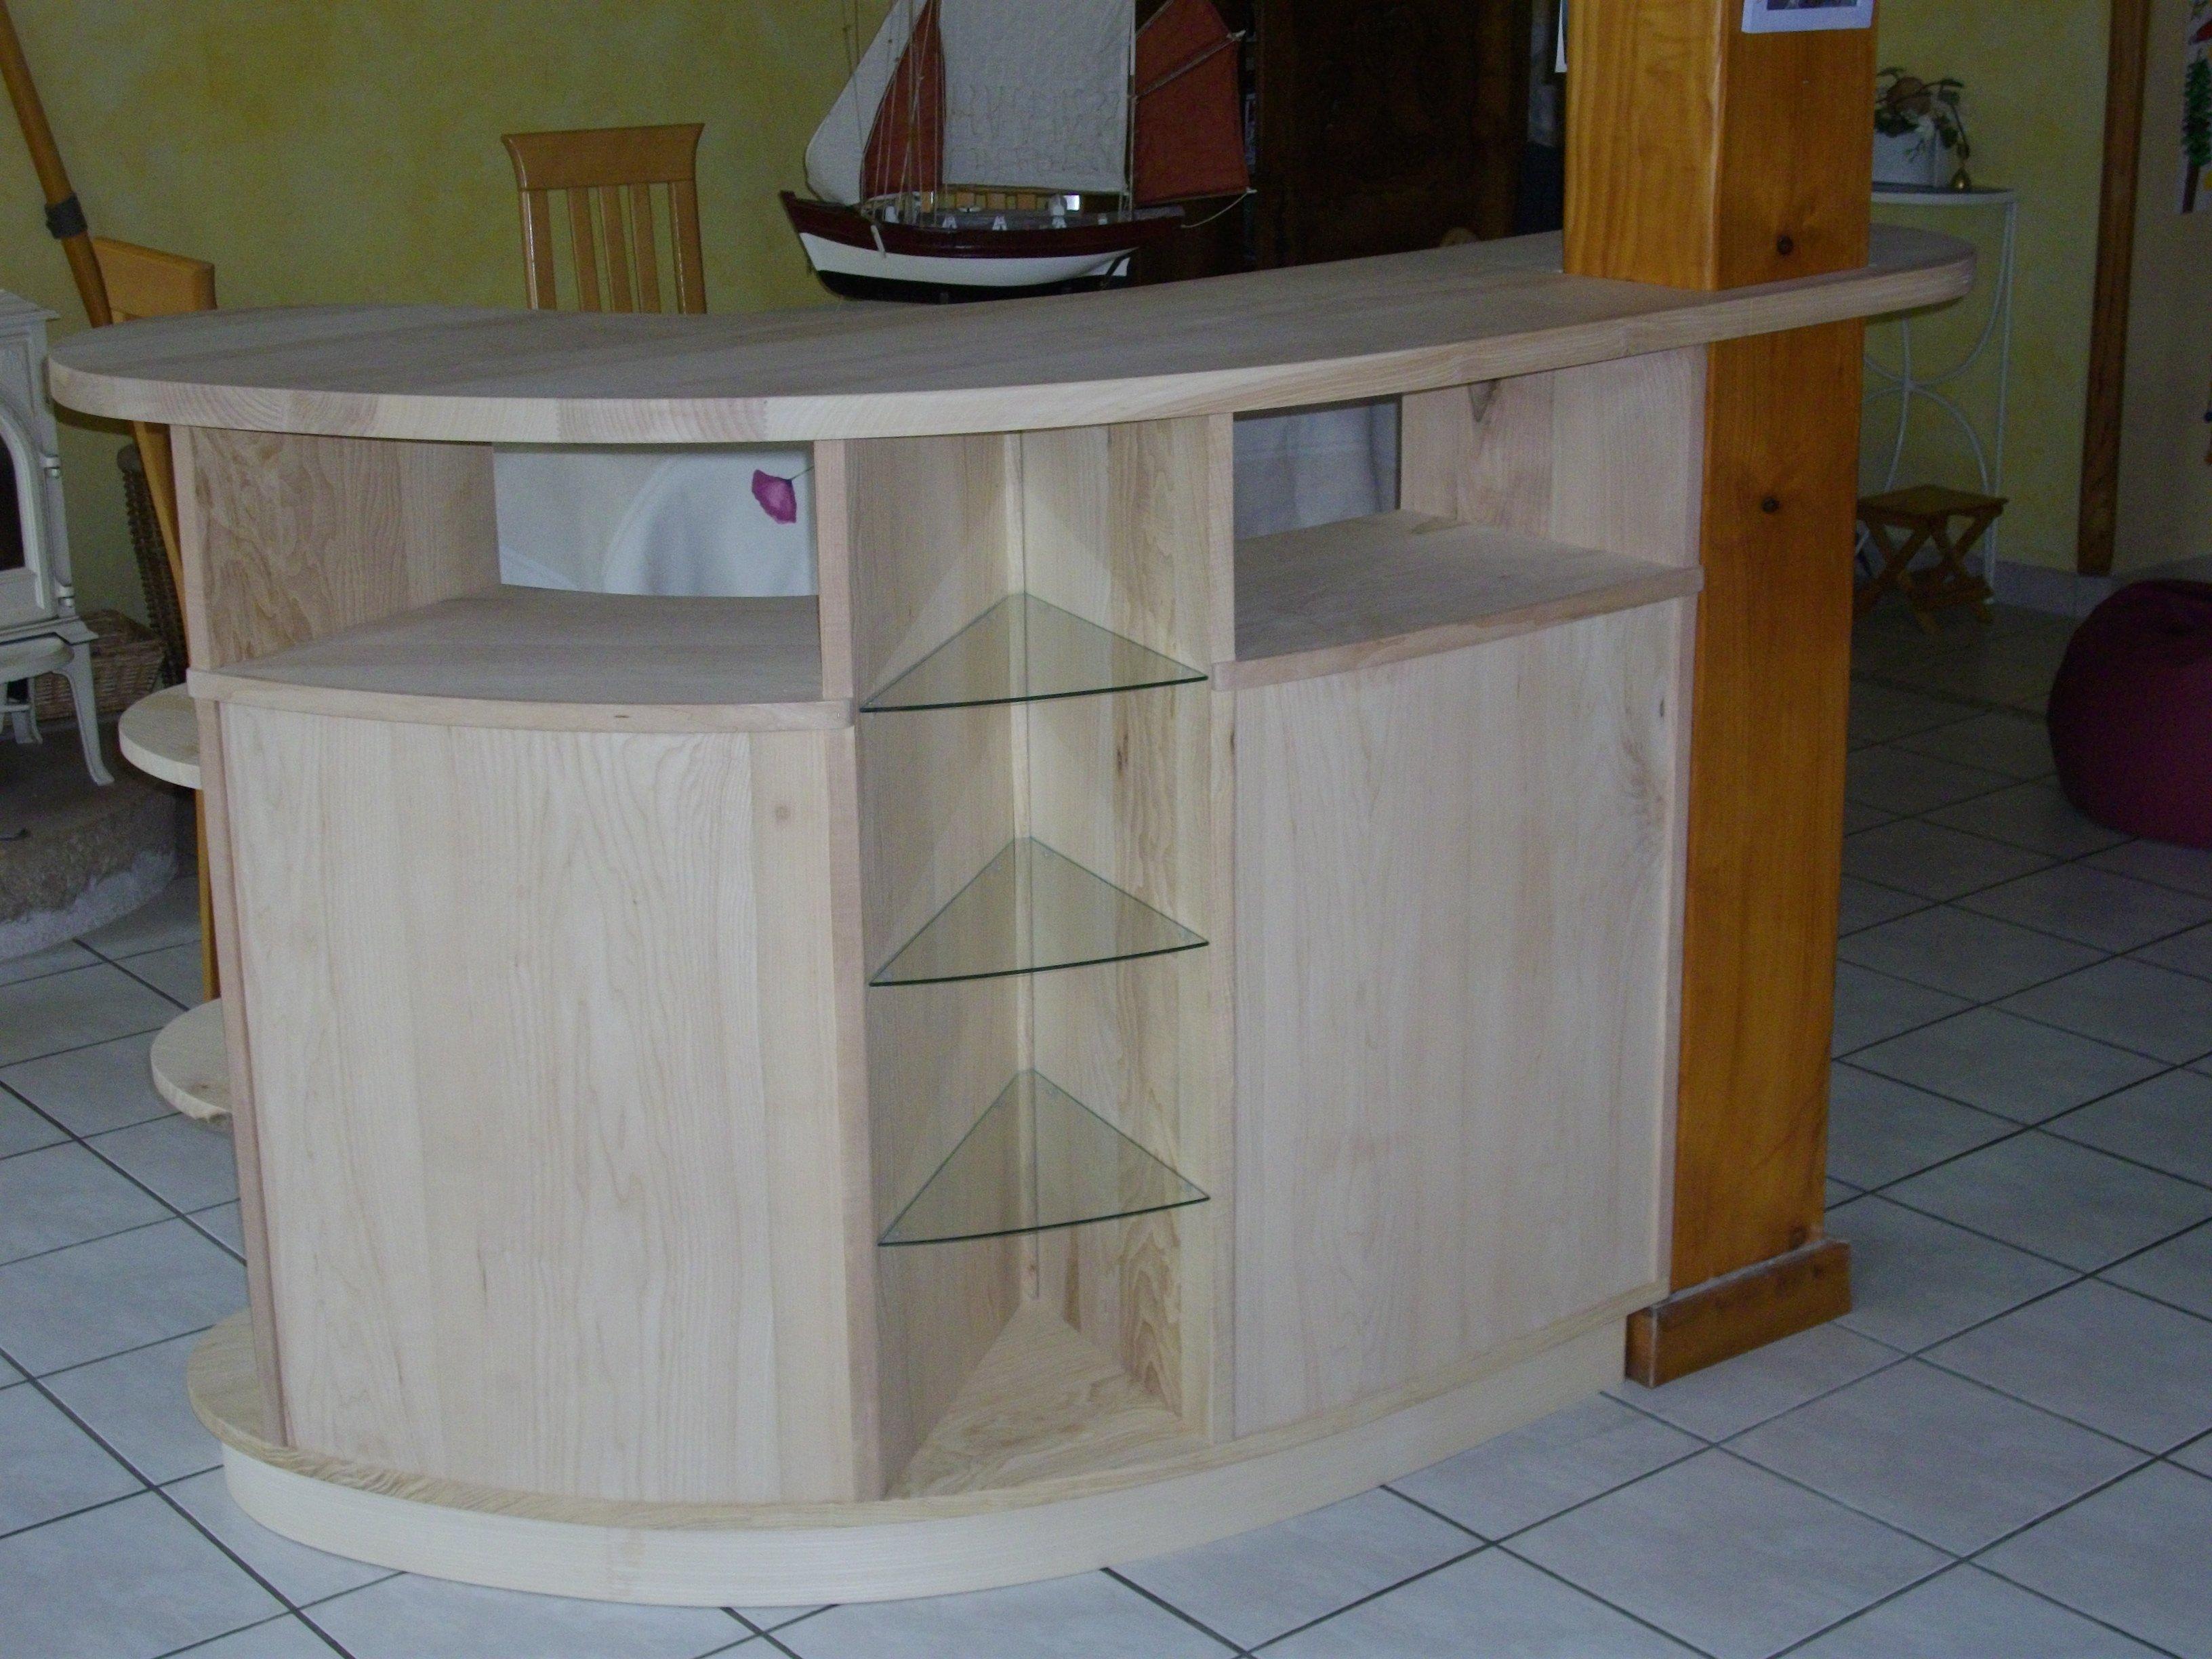 meuble bar moderne meubles de bar tabouret moderne oslo bars meuble bar blanc laqu design. Black Bedroom Furniture Sets. Home Design Ideas